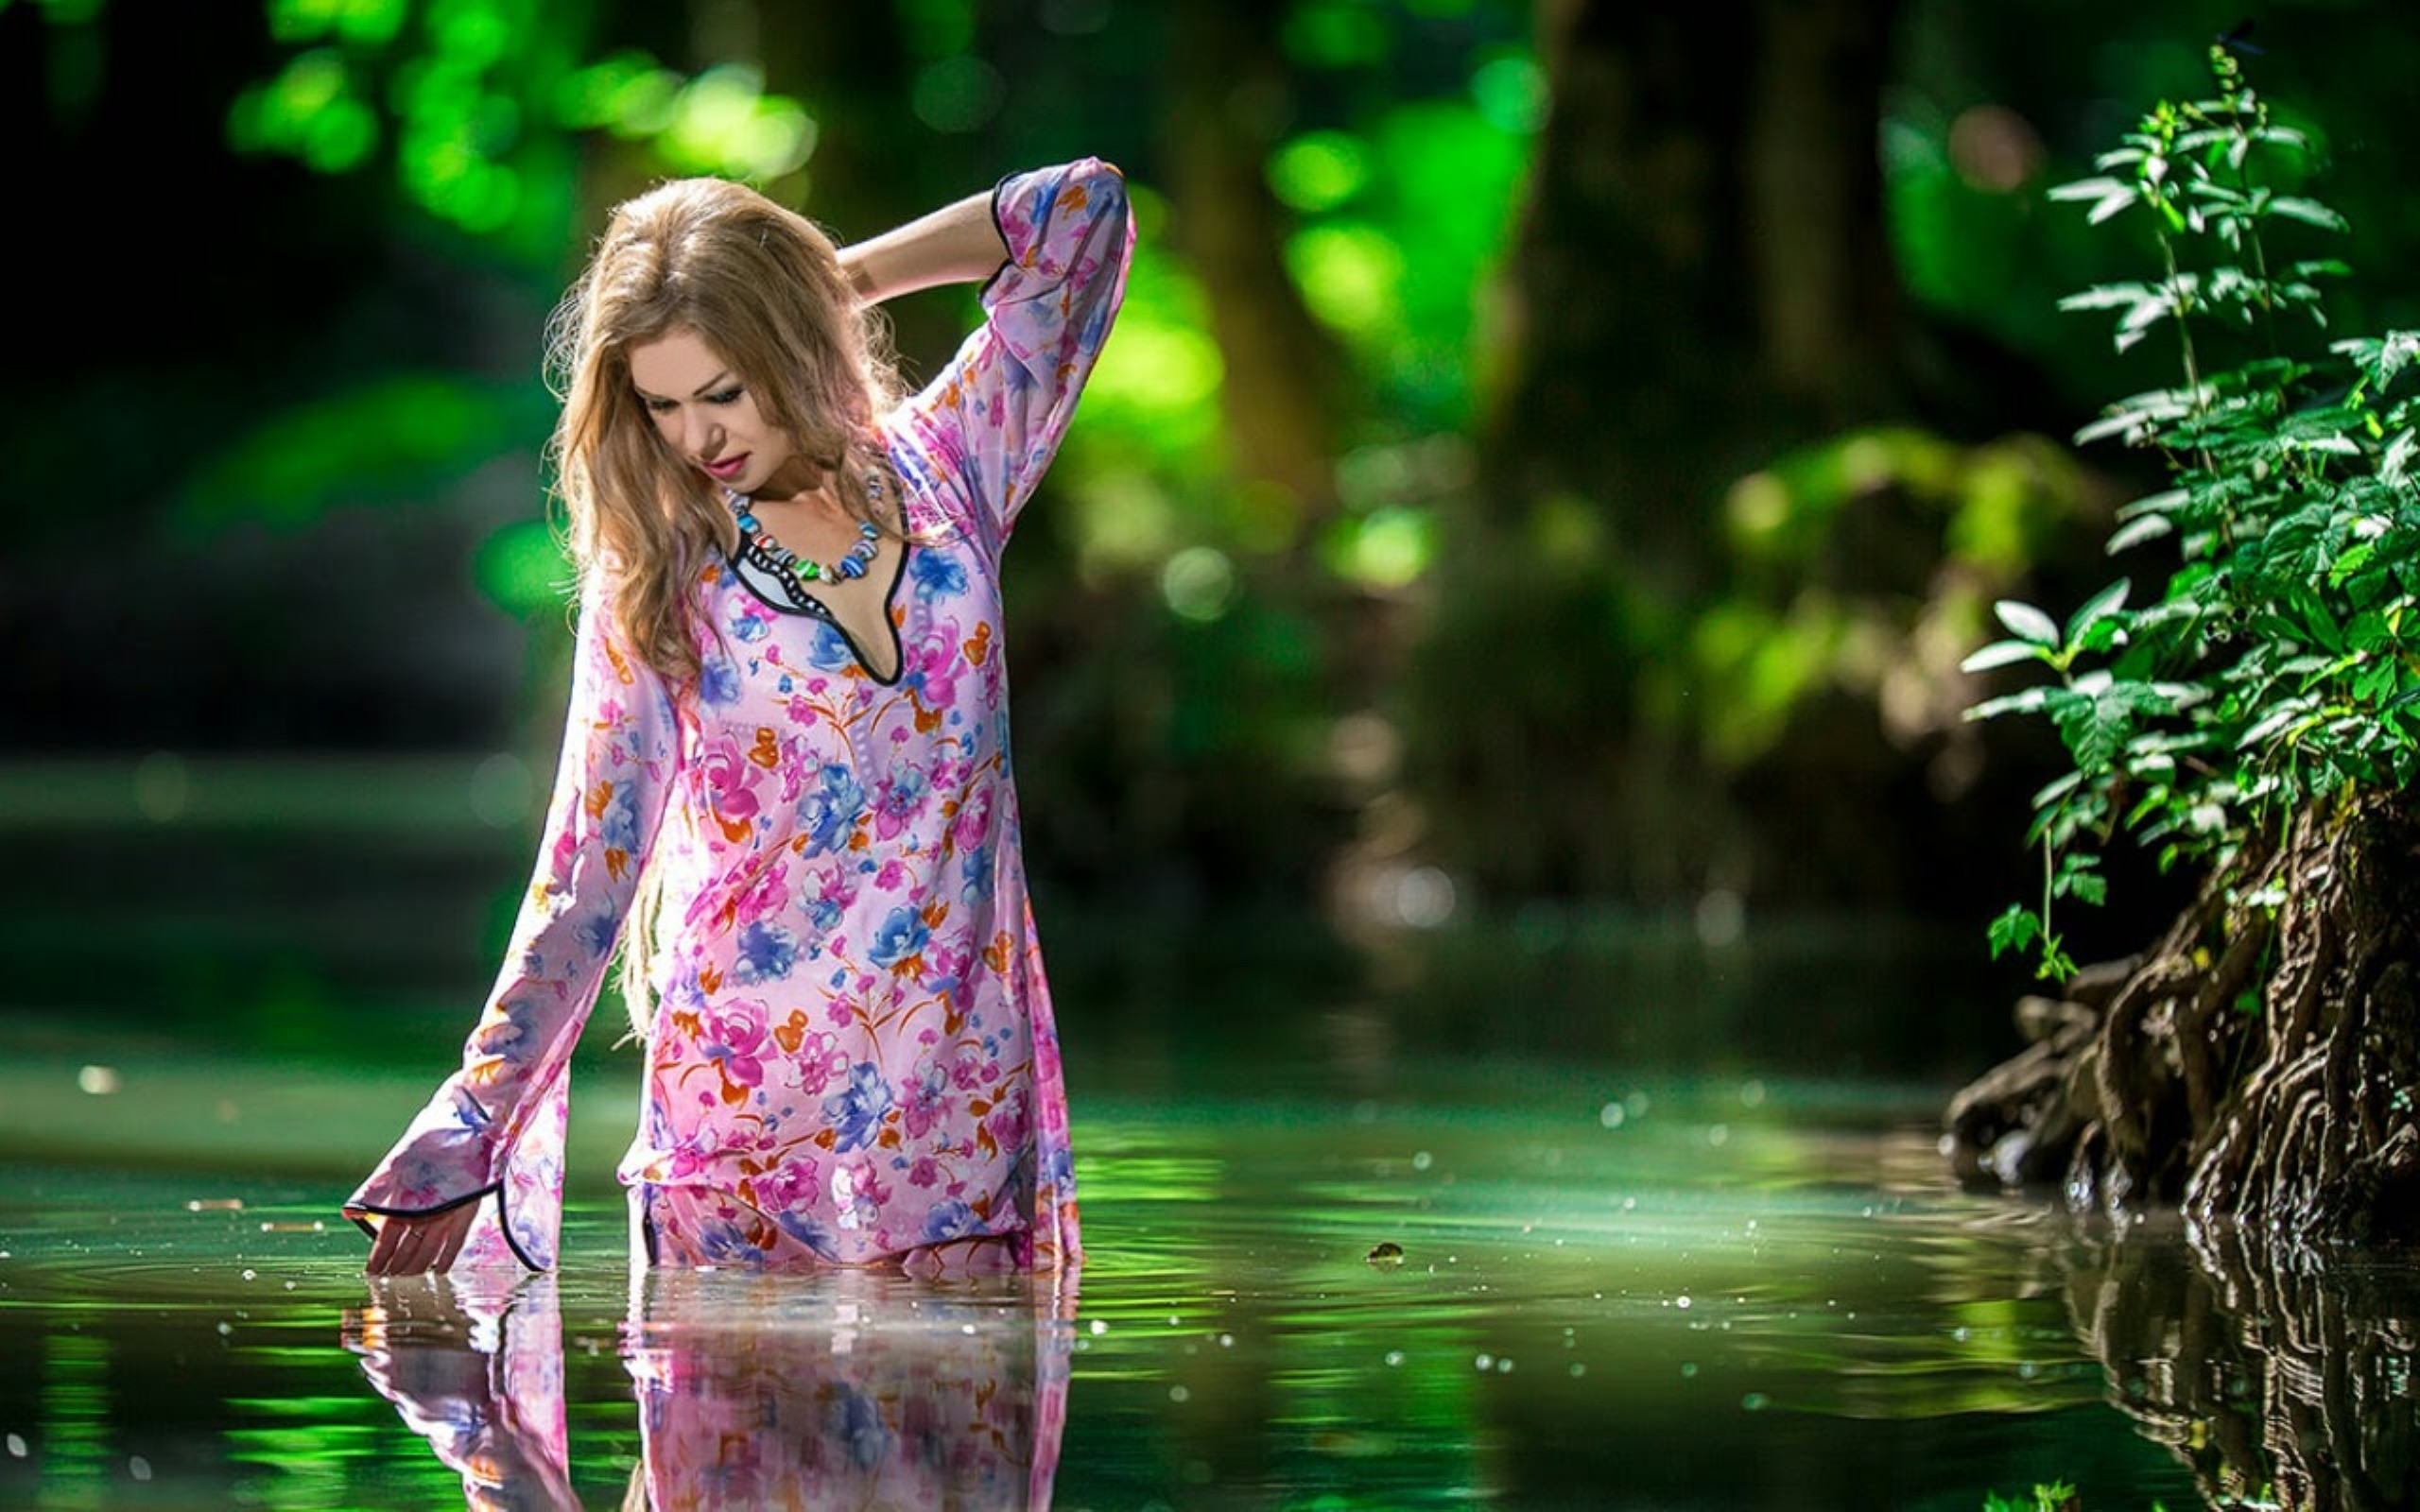 Beautiful Girl In Water Wallpaper